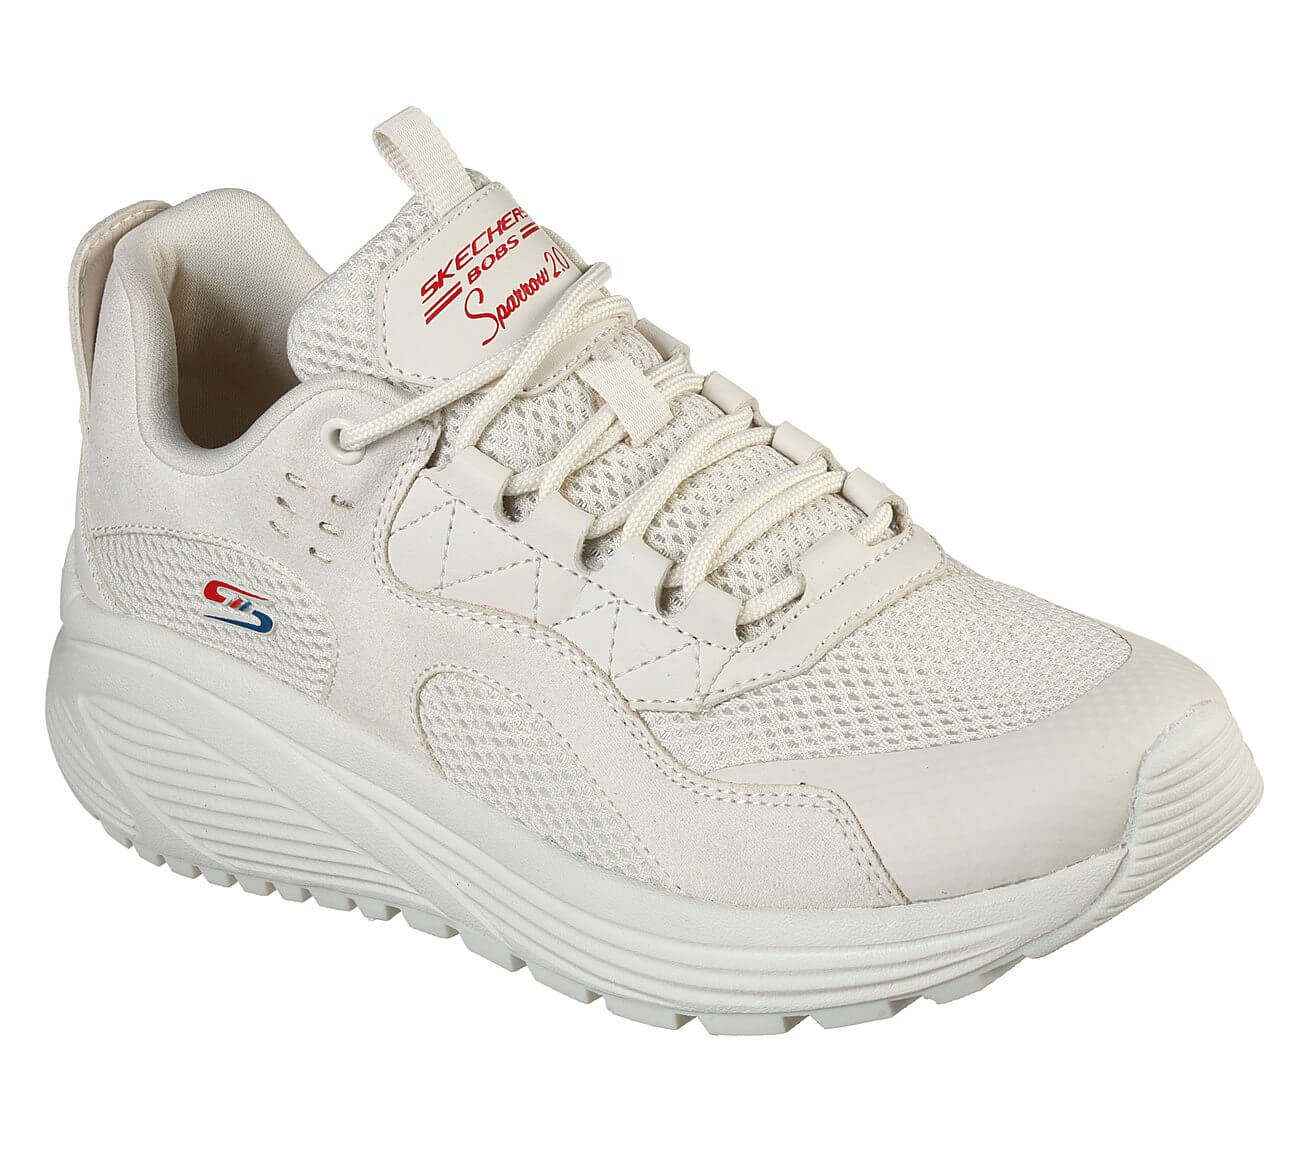 Scarpe sportive bianche